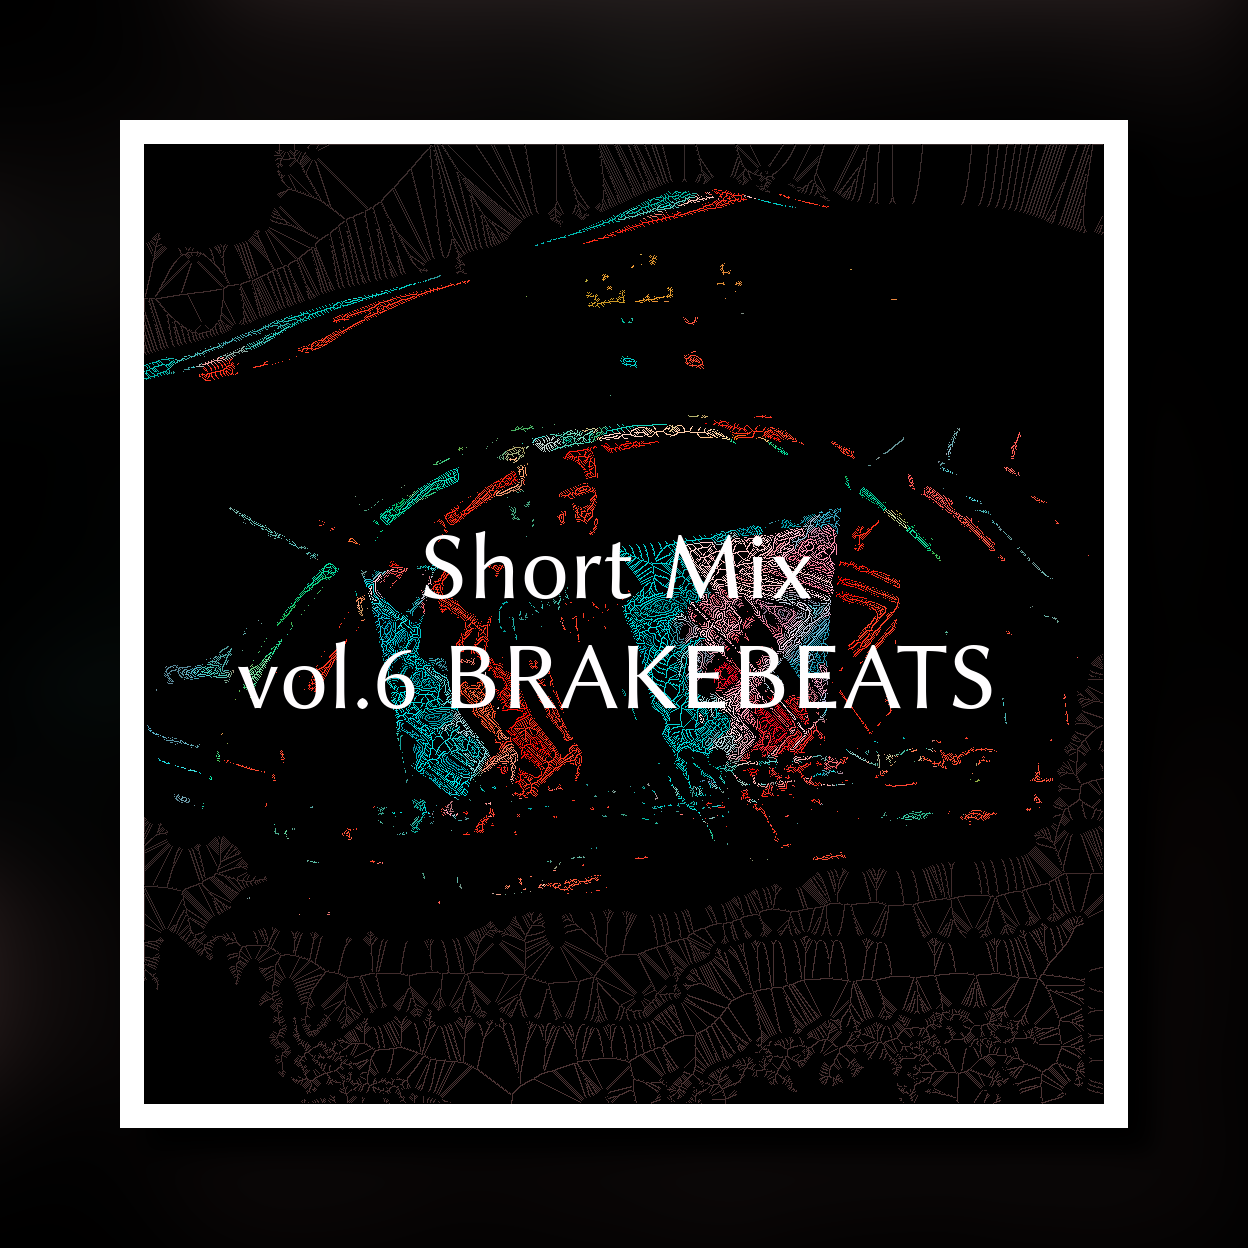 Short Mixシリーズ第6弾「Breakbeats」